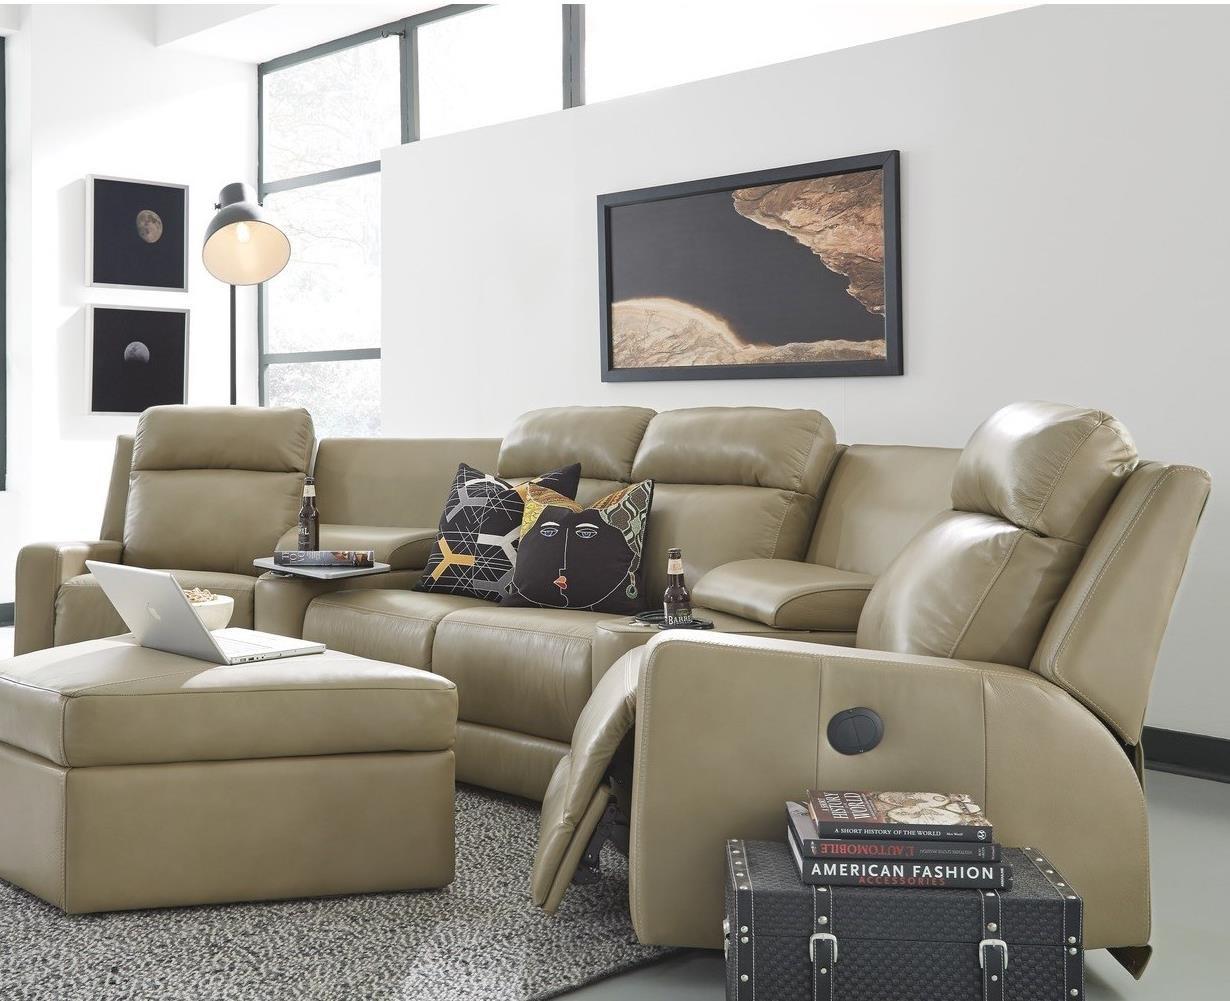 Peachy Palliser Forest Hill 4 Seat Power Reclining Sectional Sofa Alphanode Cool Chair Designs And Ideas Alphanodeonline